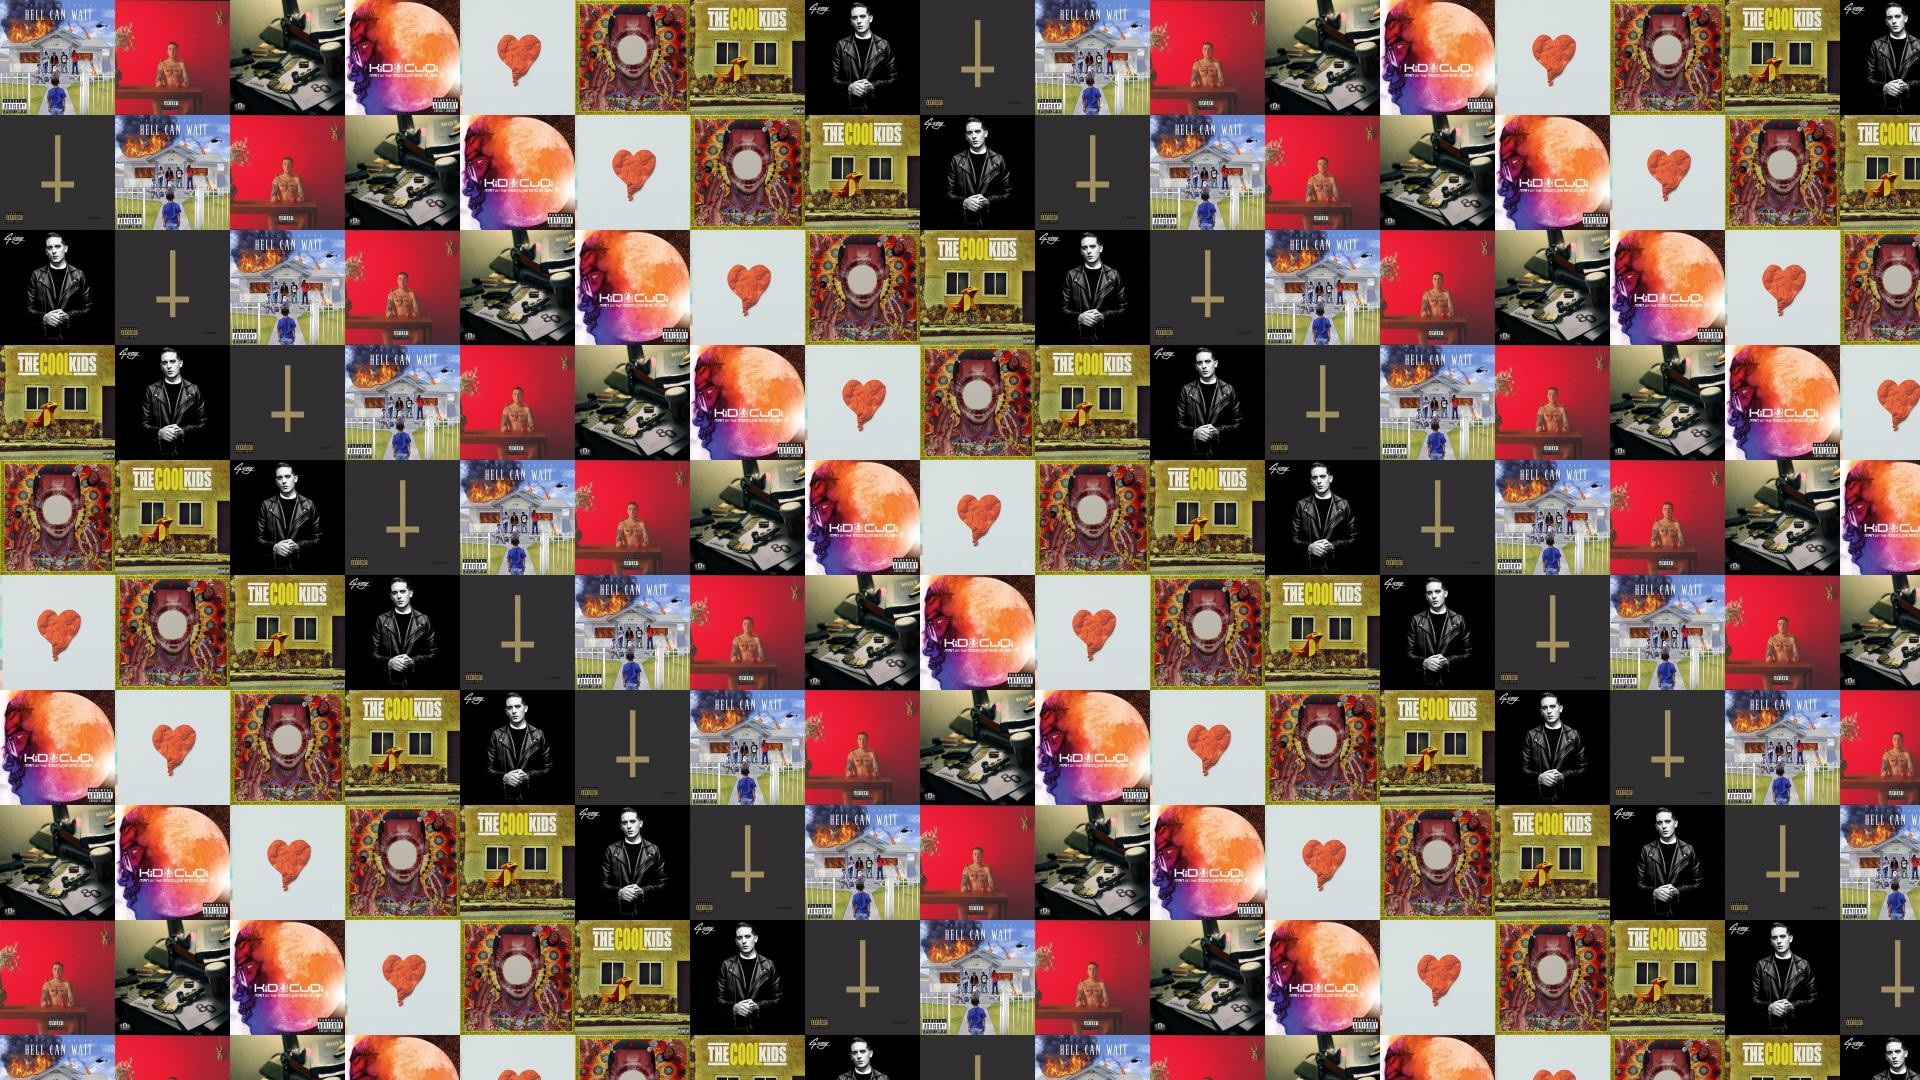 57 Wallpaper S8 Samsung Astronouyt On Wallpapersafari